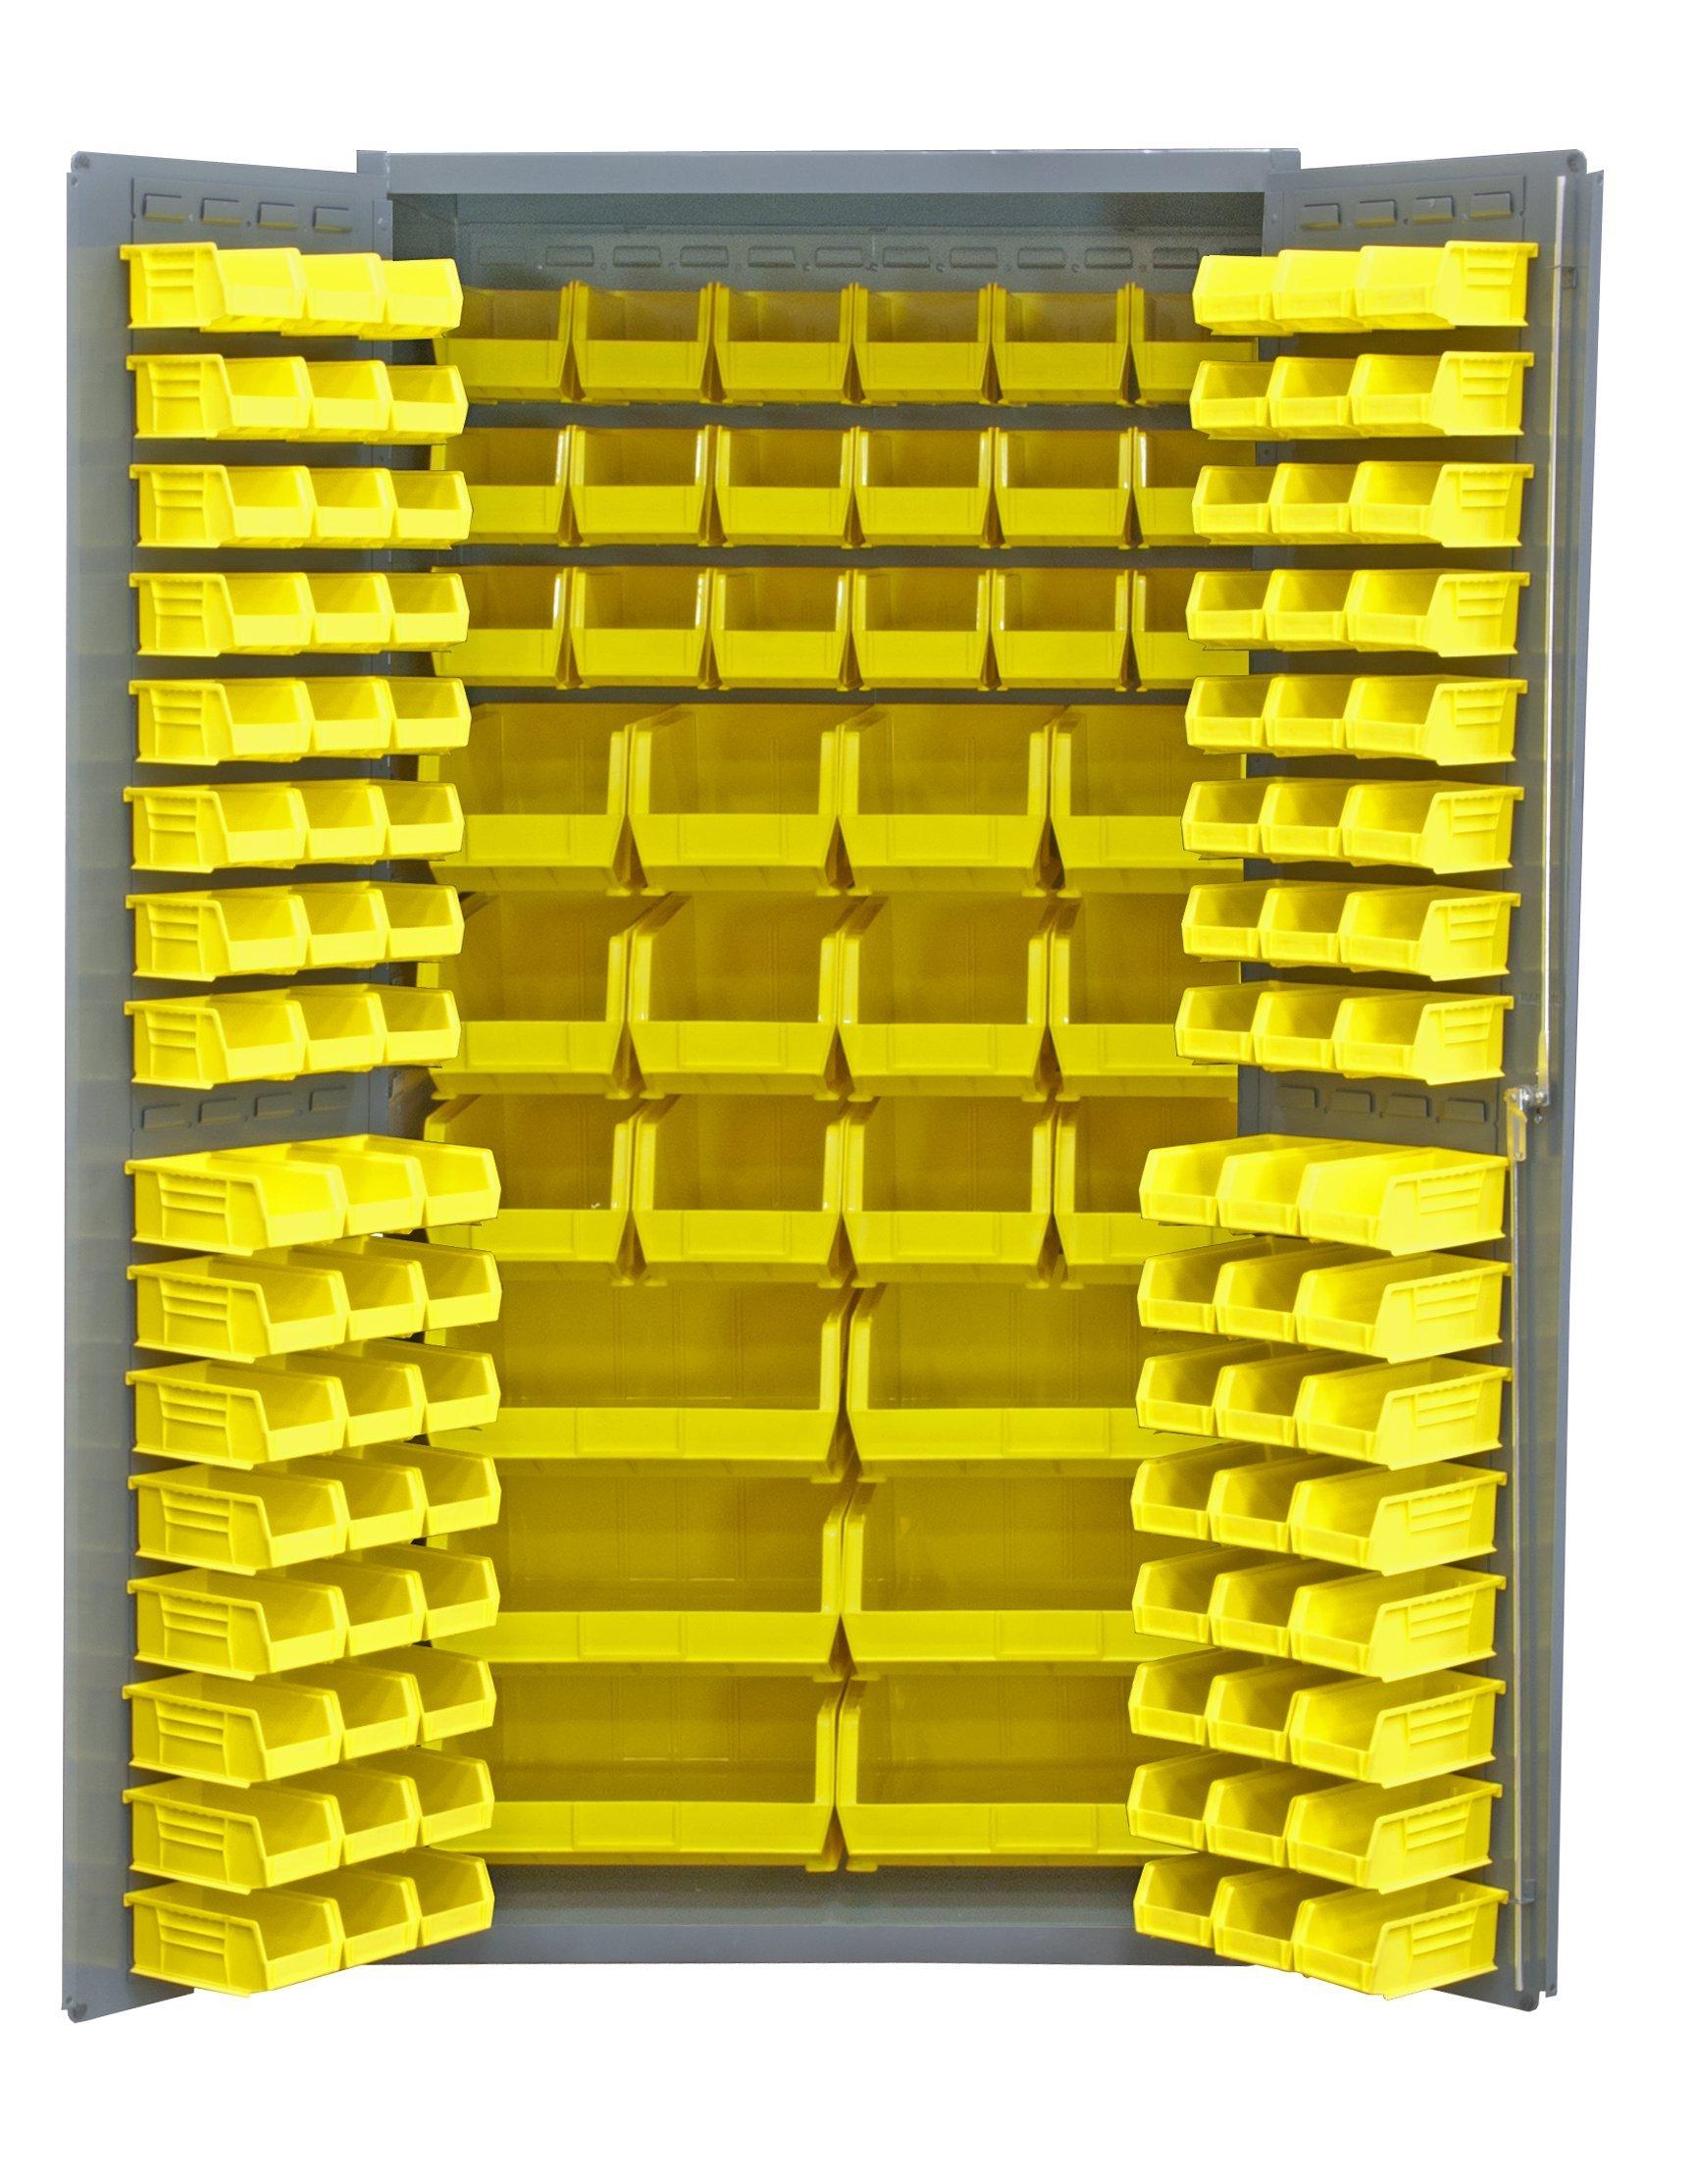 Durham 14 Gauge Welded Steel Heavy Duty Flush Door Style Storage Cabinet with 132 Bins, 3501-BDLP-132-95,  24'' Length x 36'' Width x 72'' Height